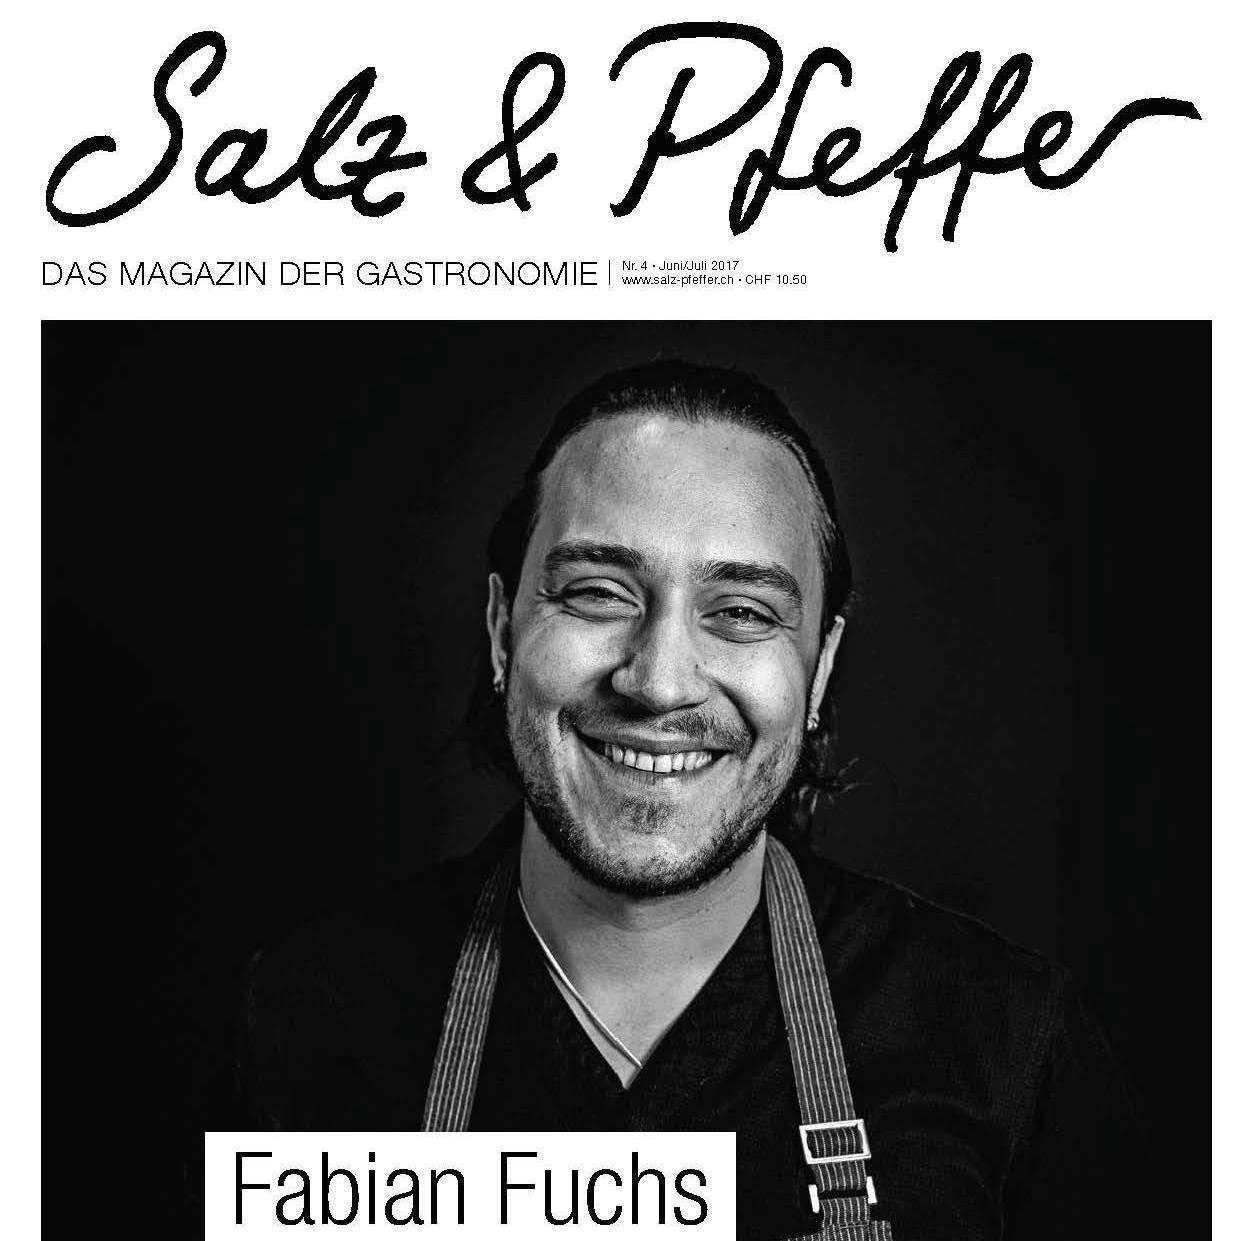 12.06.2017, Salz&Pfeffer    Kompromisslos